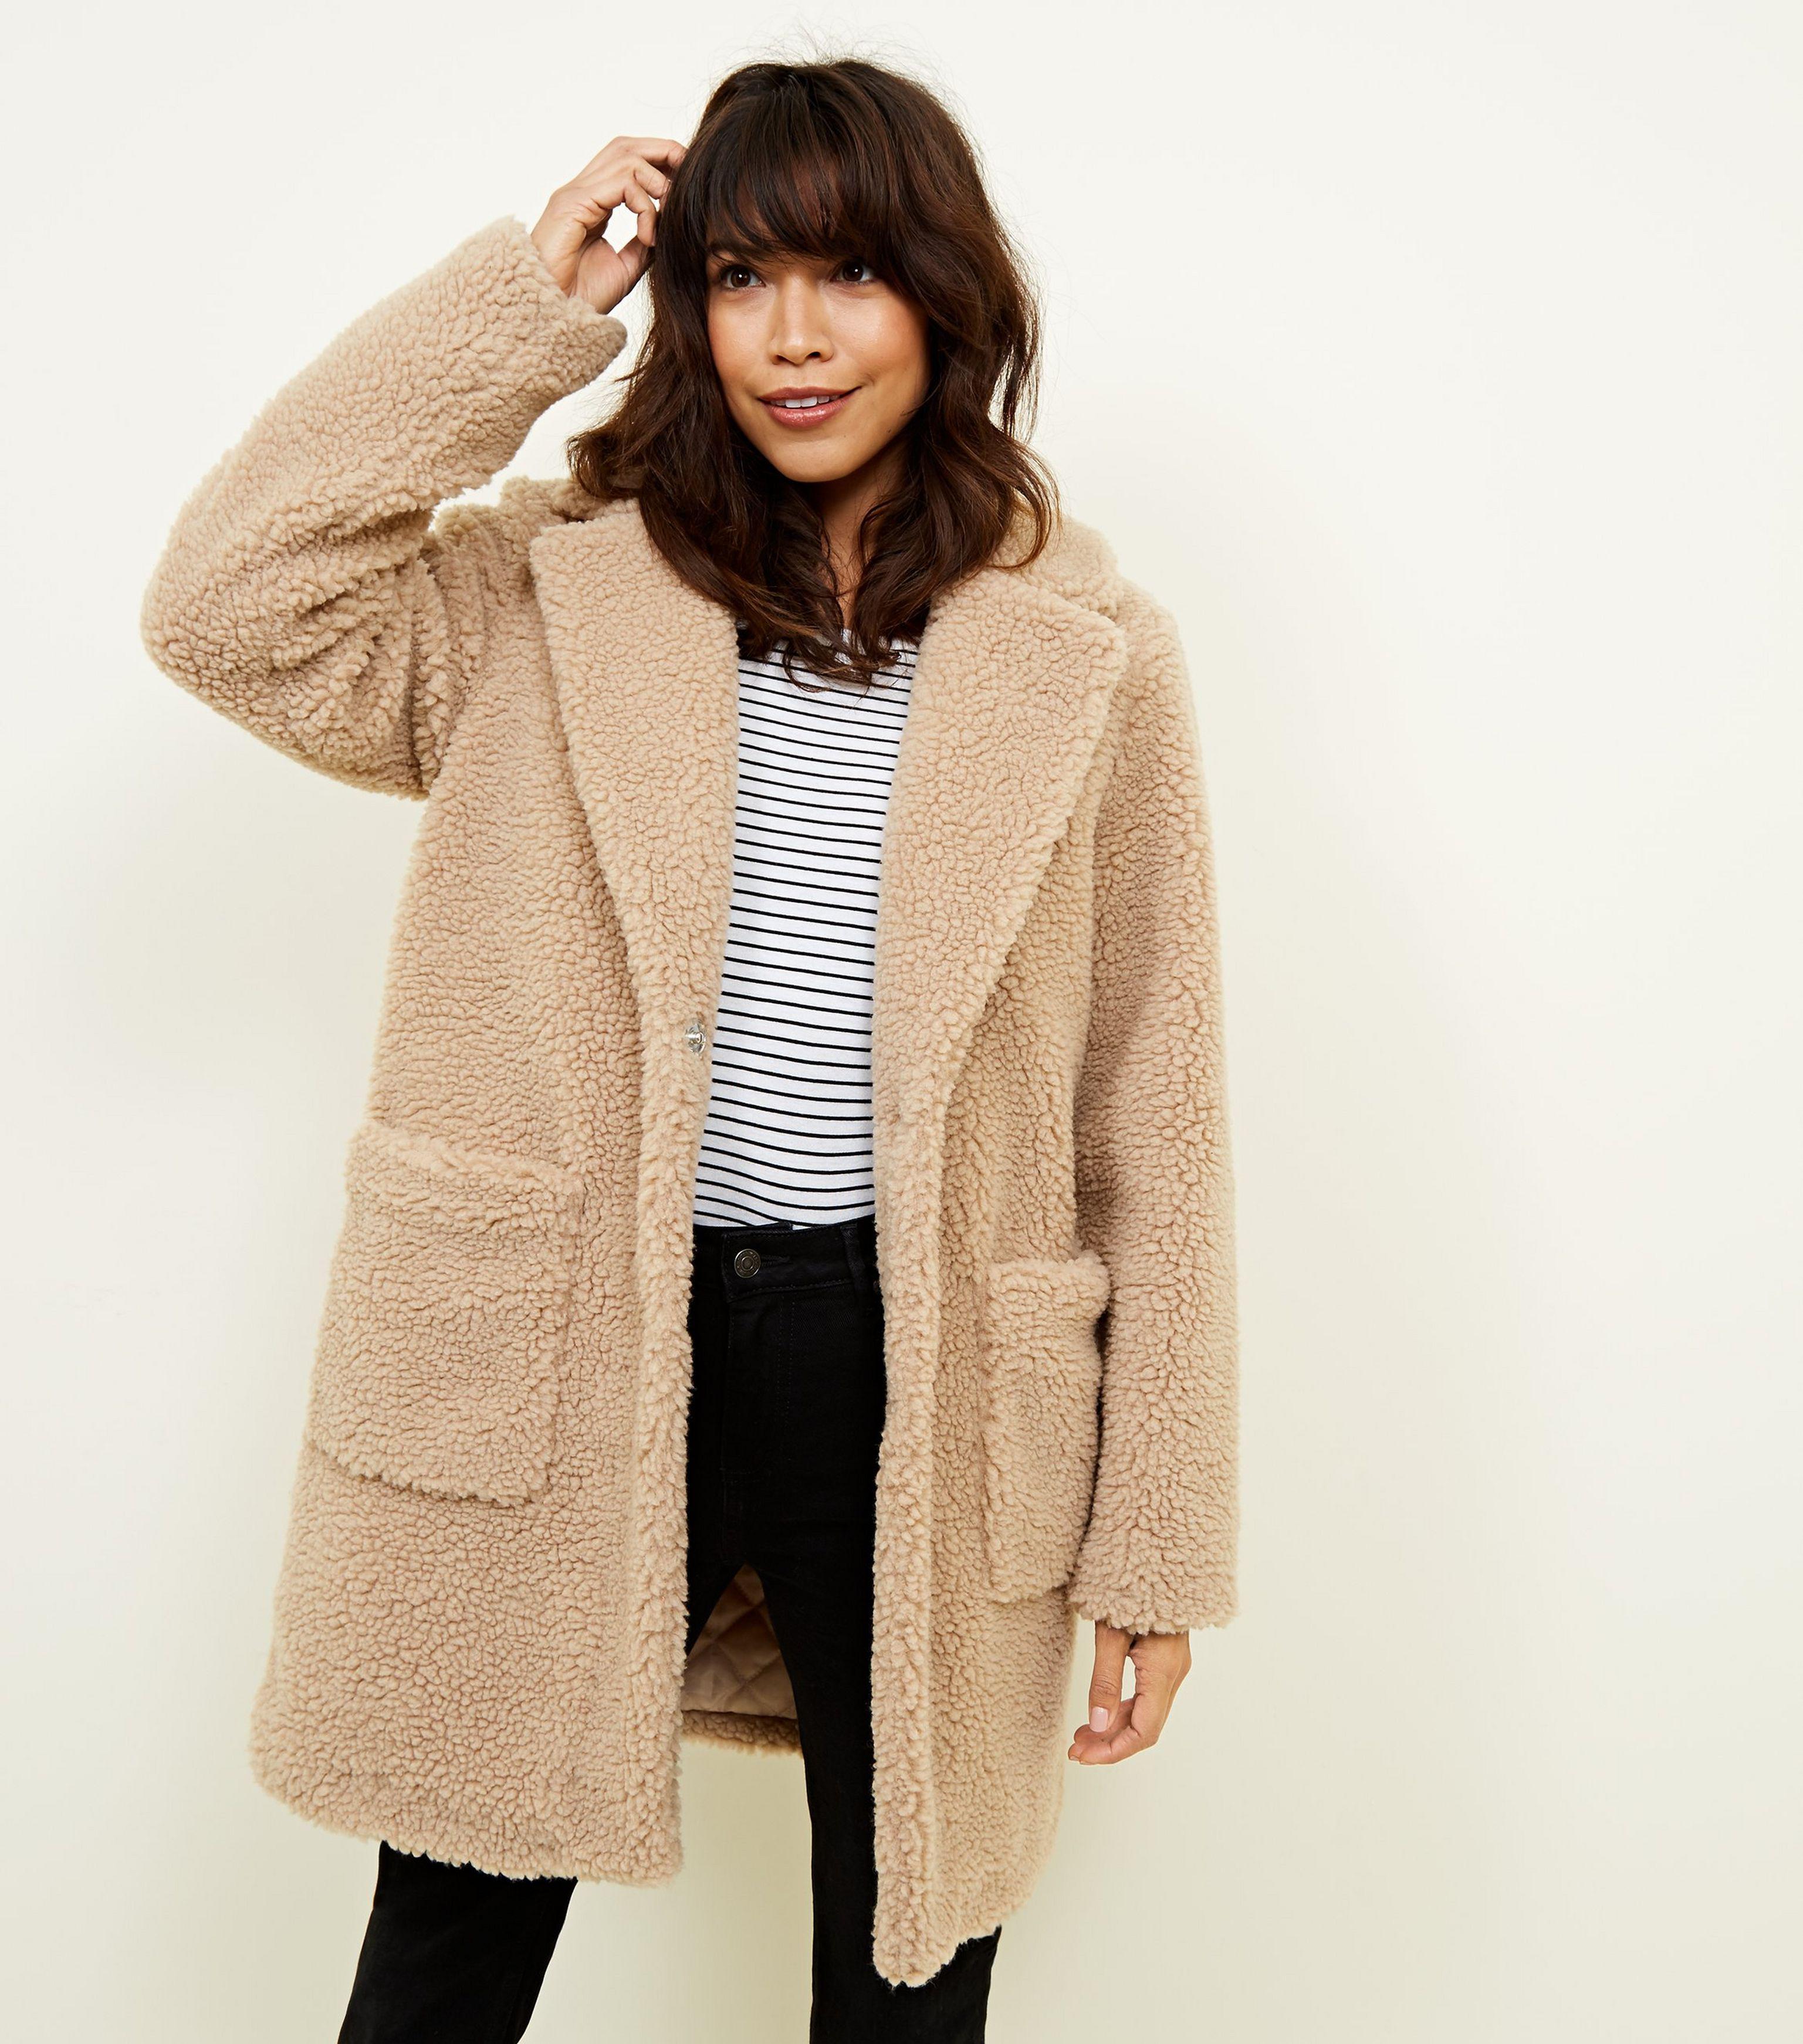 7418bcb5ecca New Look Cream Teddy Coat in Natural - Lyst